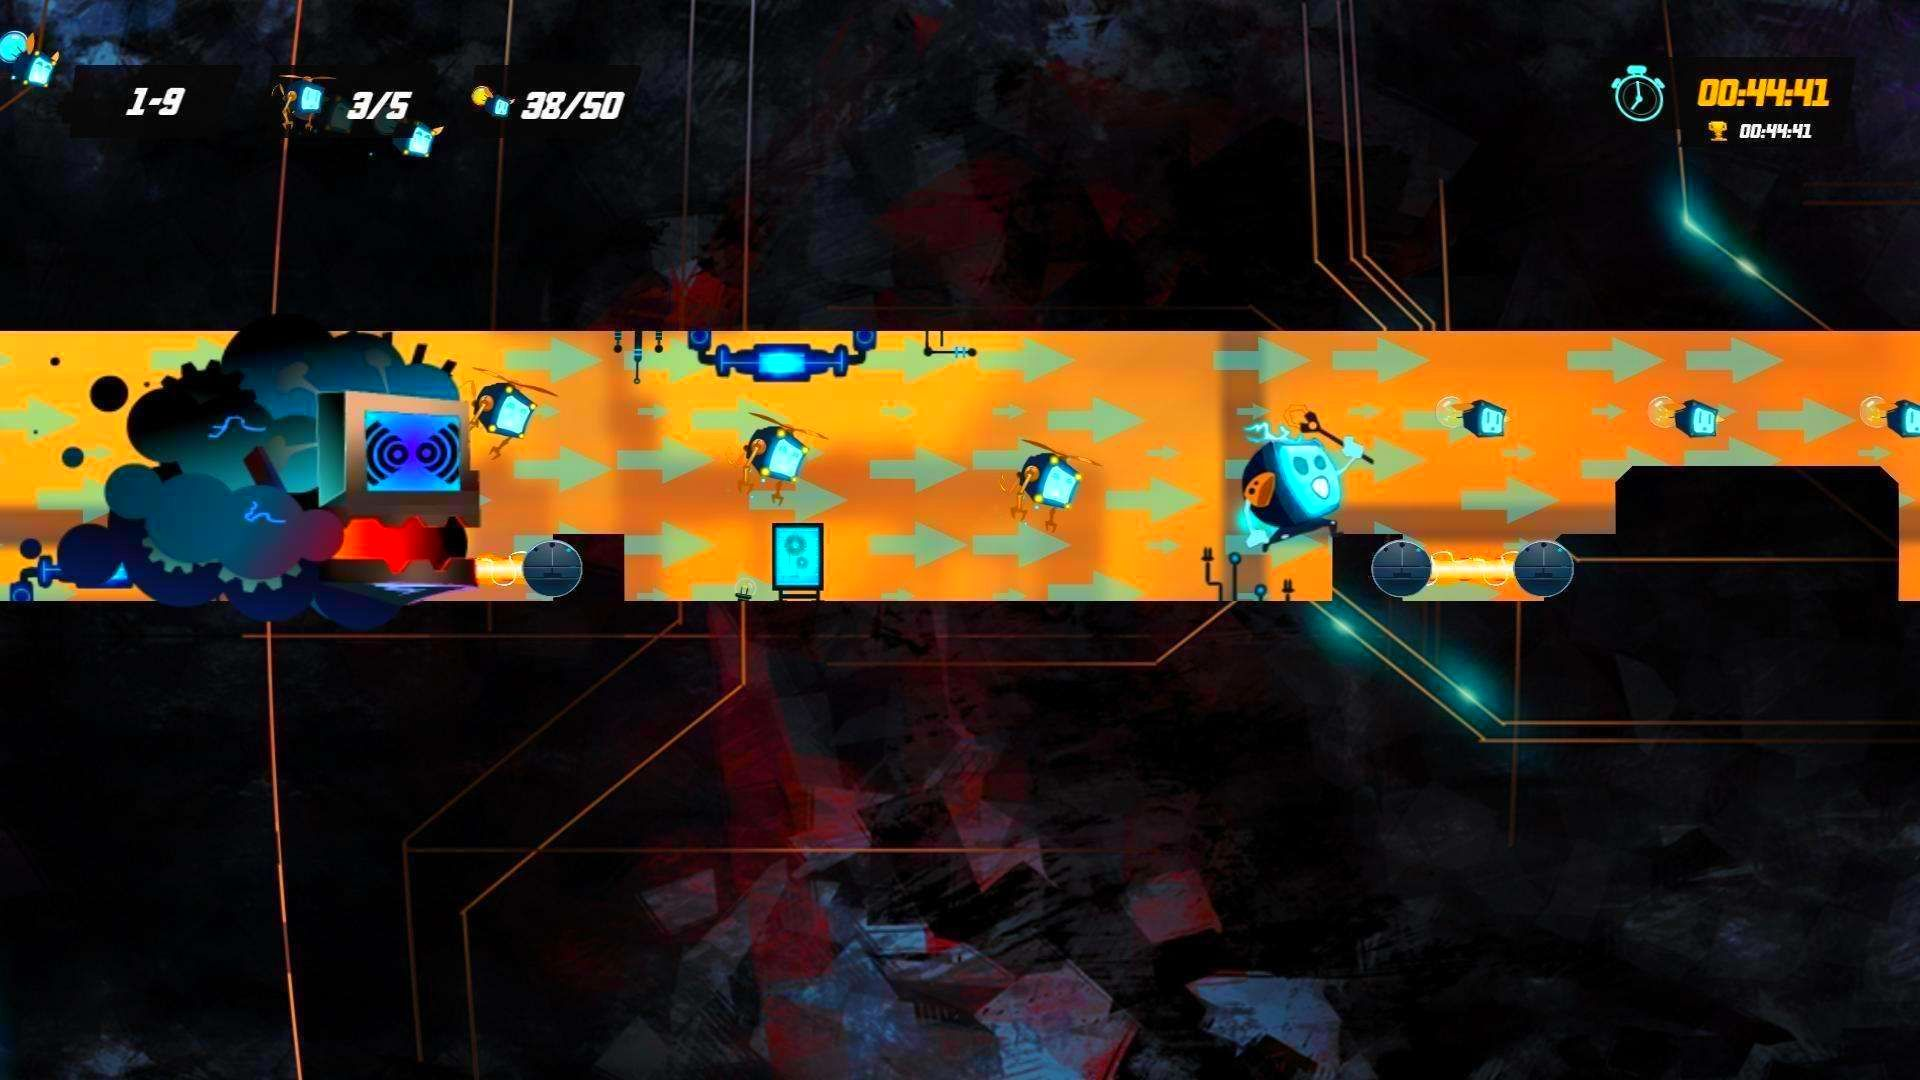 Screenshot from Mechanic Escape (1/5)